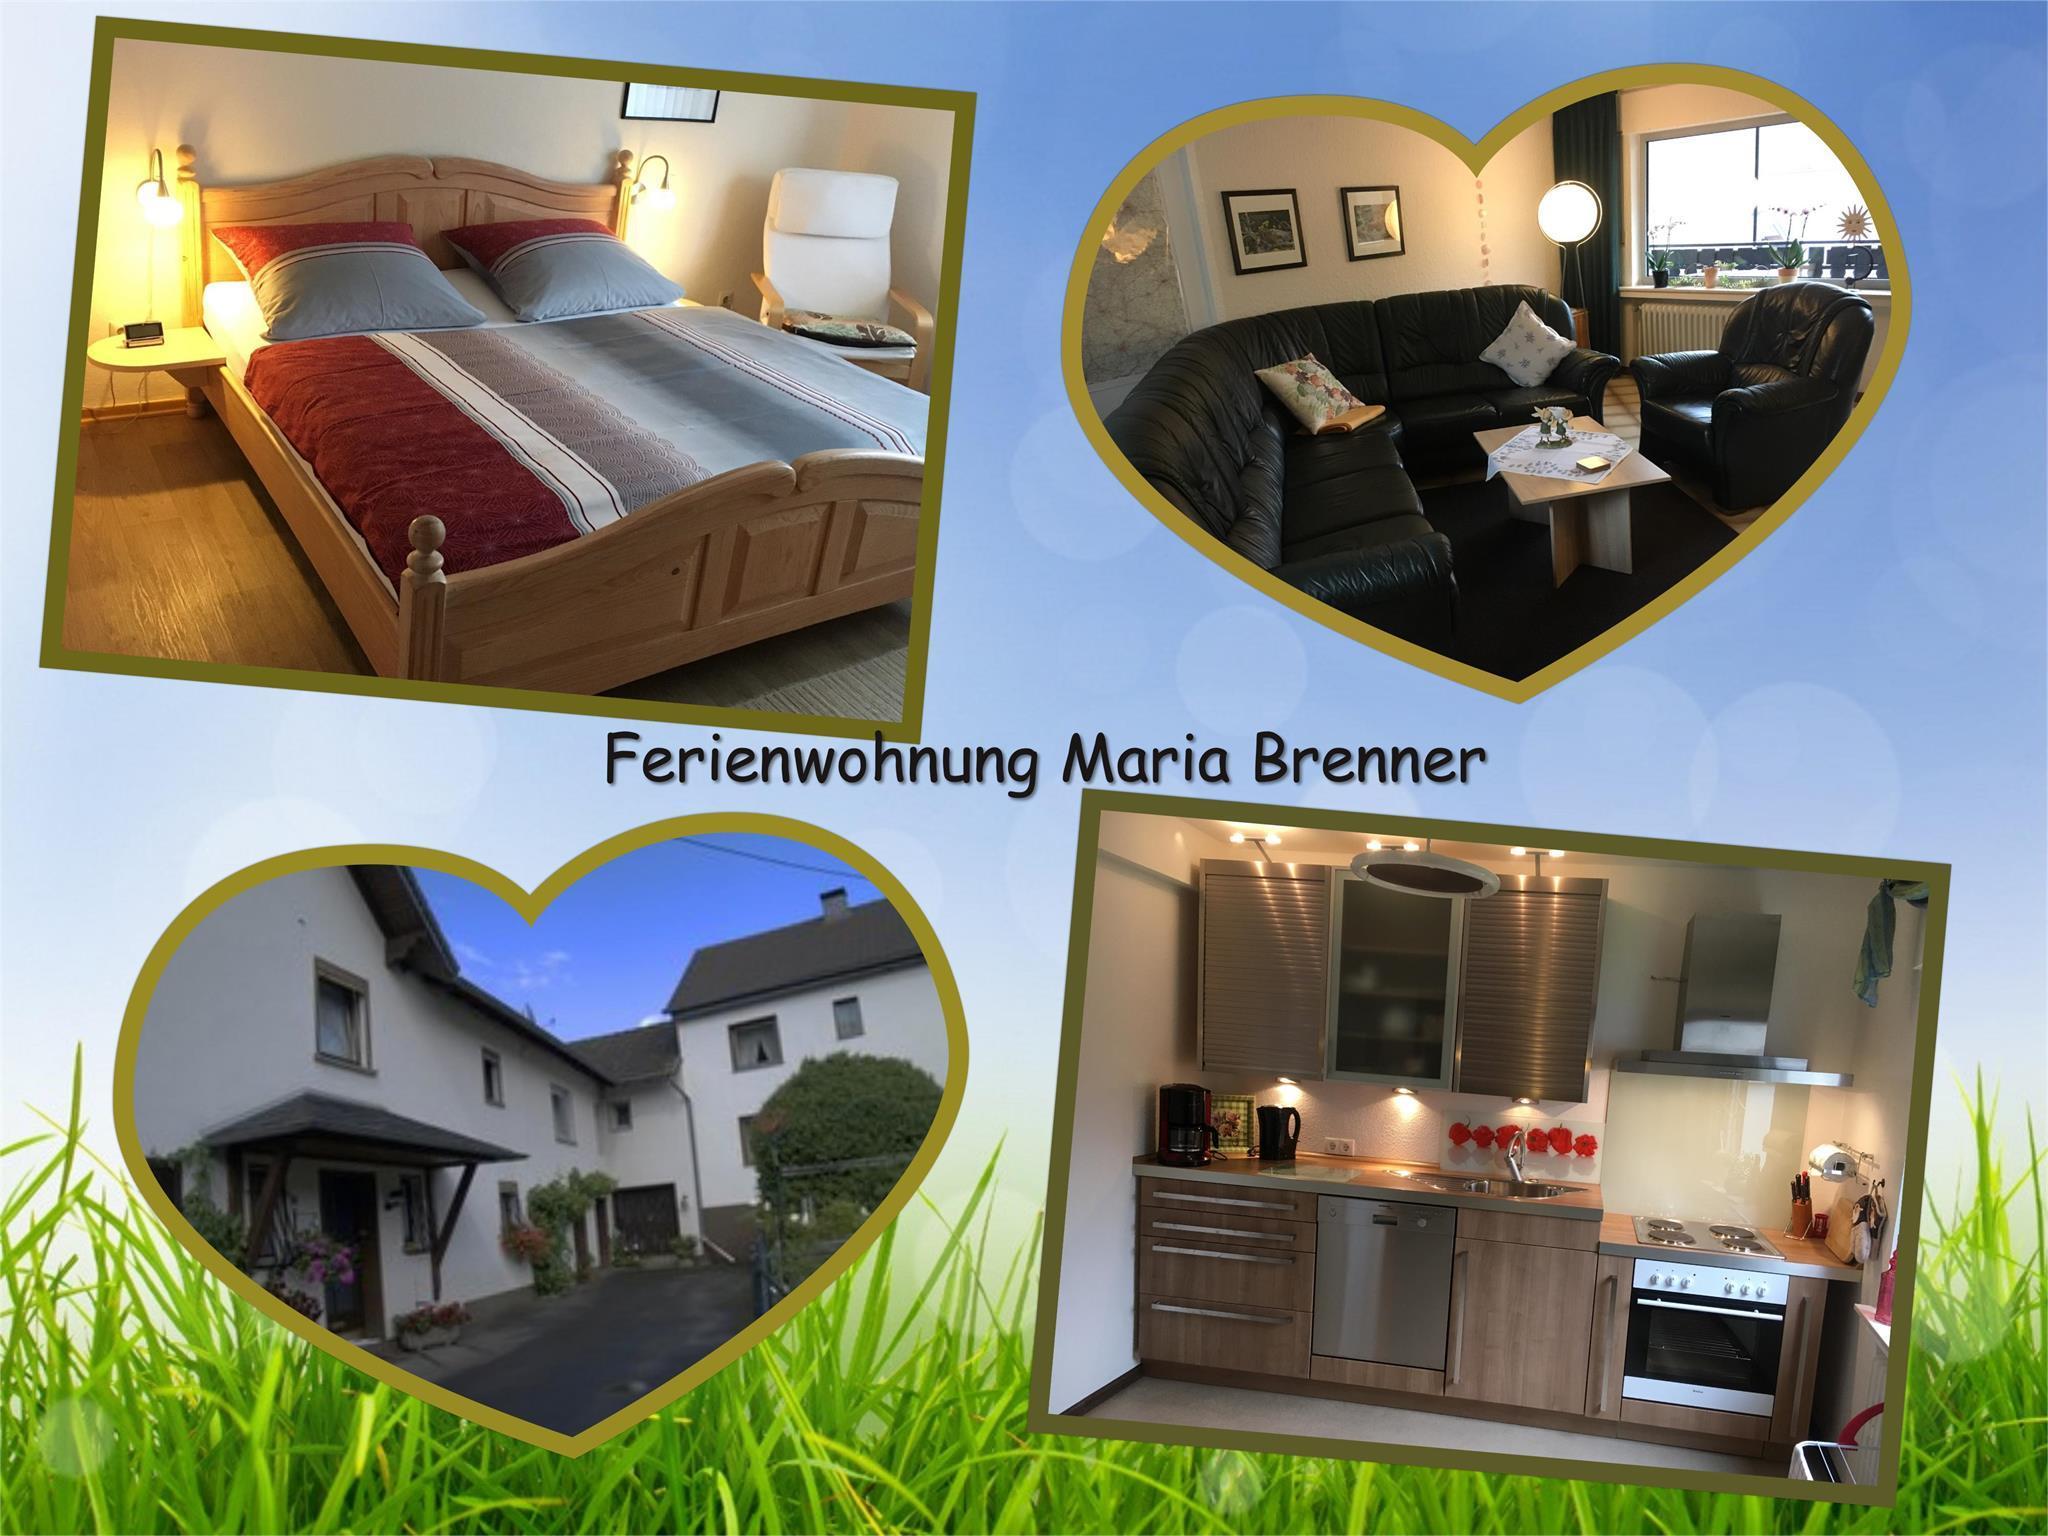 Ferienwohnung Brenner, @ Ferienwohnung Brenner